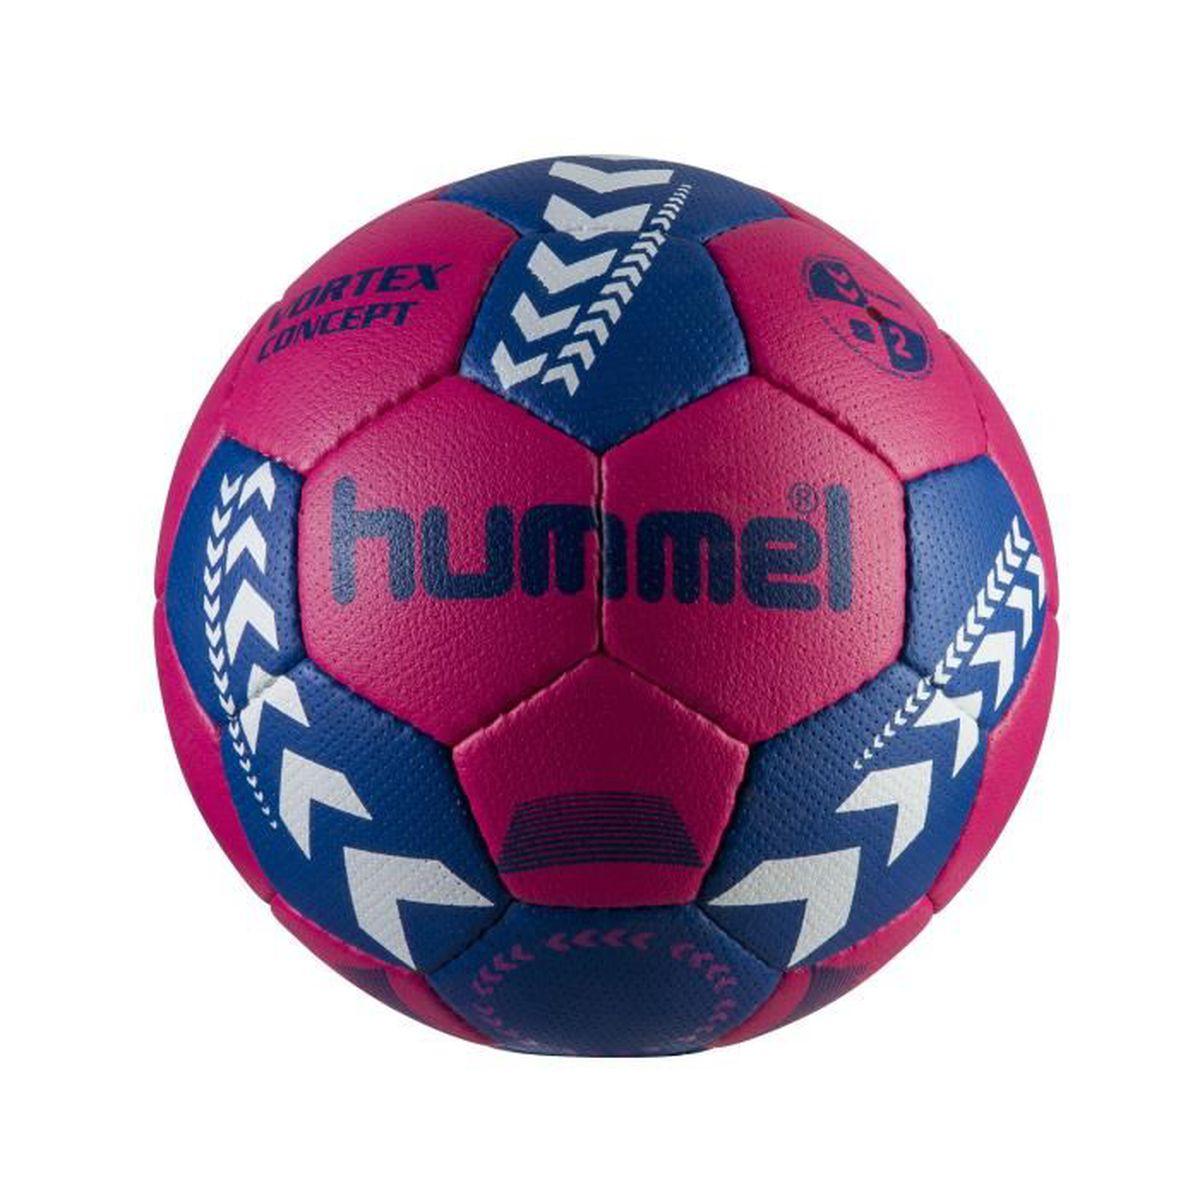 ballon handball pas cher. Black Bedroom Furniture Sets. Home Design Ideas